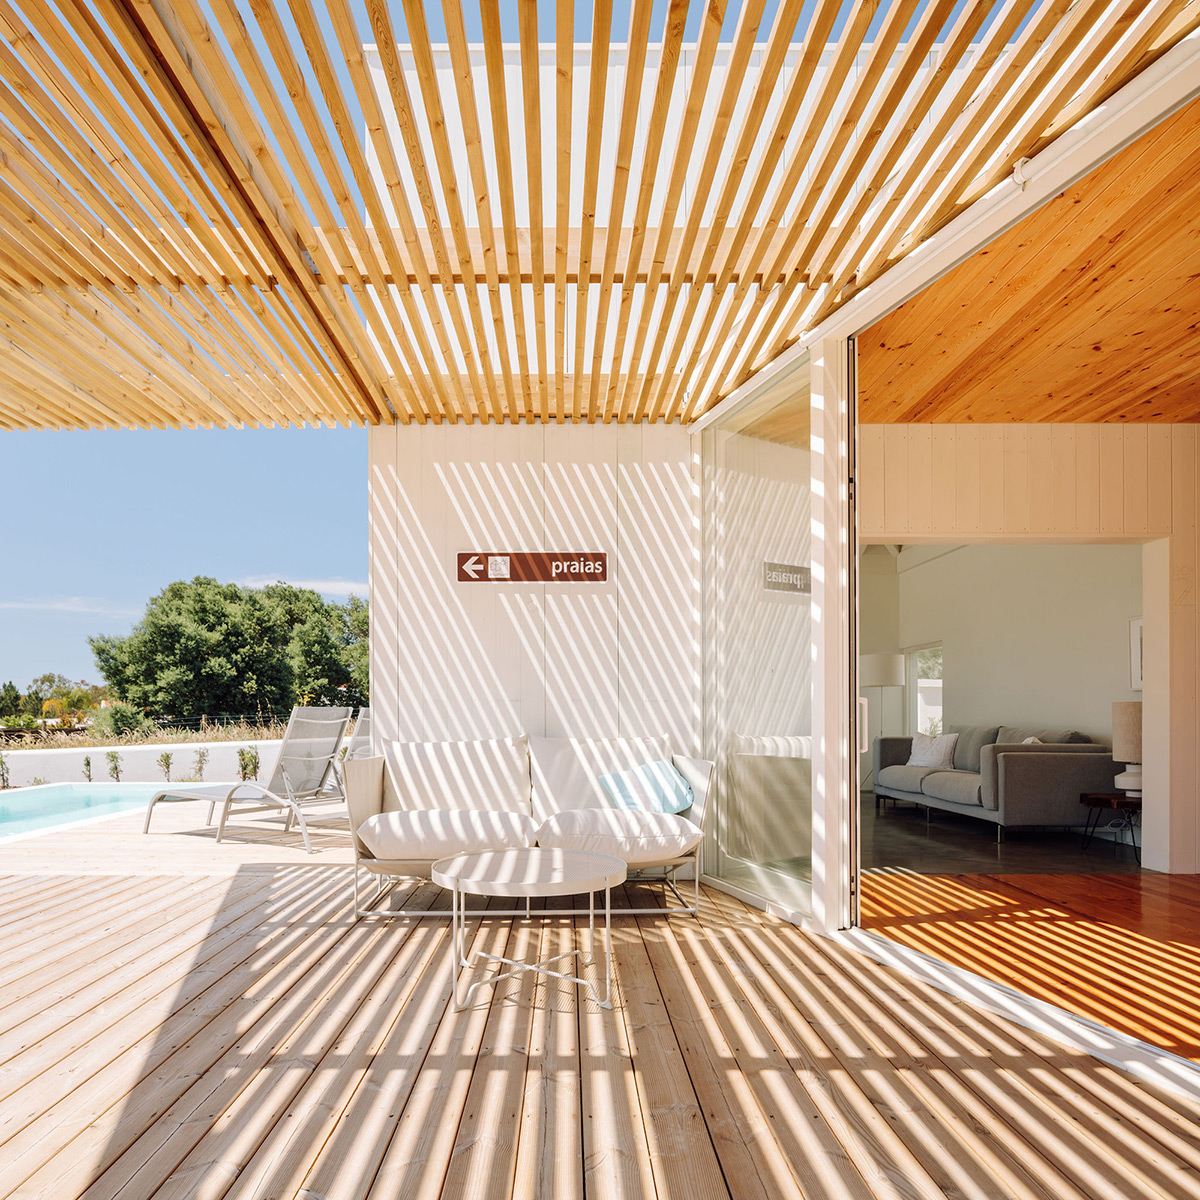 Casa-Comporta-Almeida-Fernandes-Arquitectura-Francisco-Nogueira-04